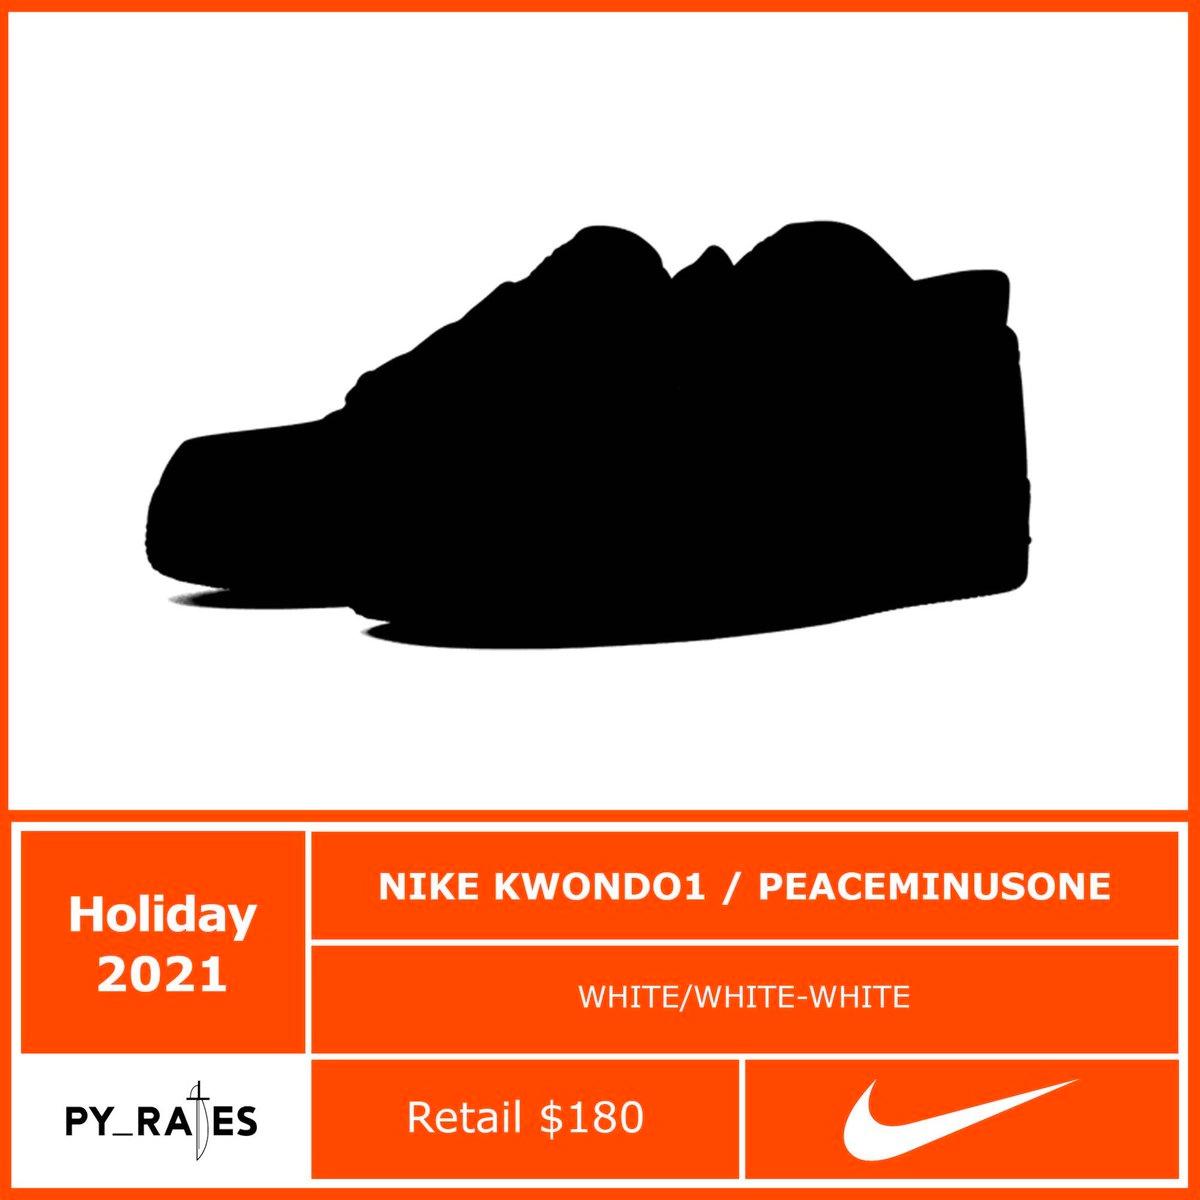 Nike,权志龙,PEACEMINUSONE,Kwondo  质感奢华!权志龙亲晒 Nike 联名新鞋!鞋底都有小雏菊!